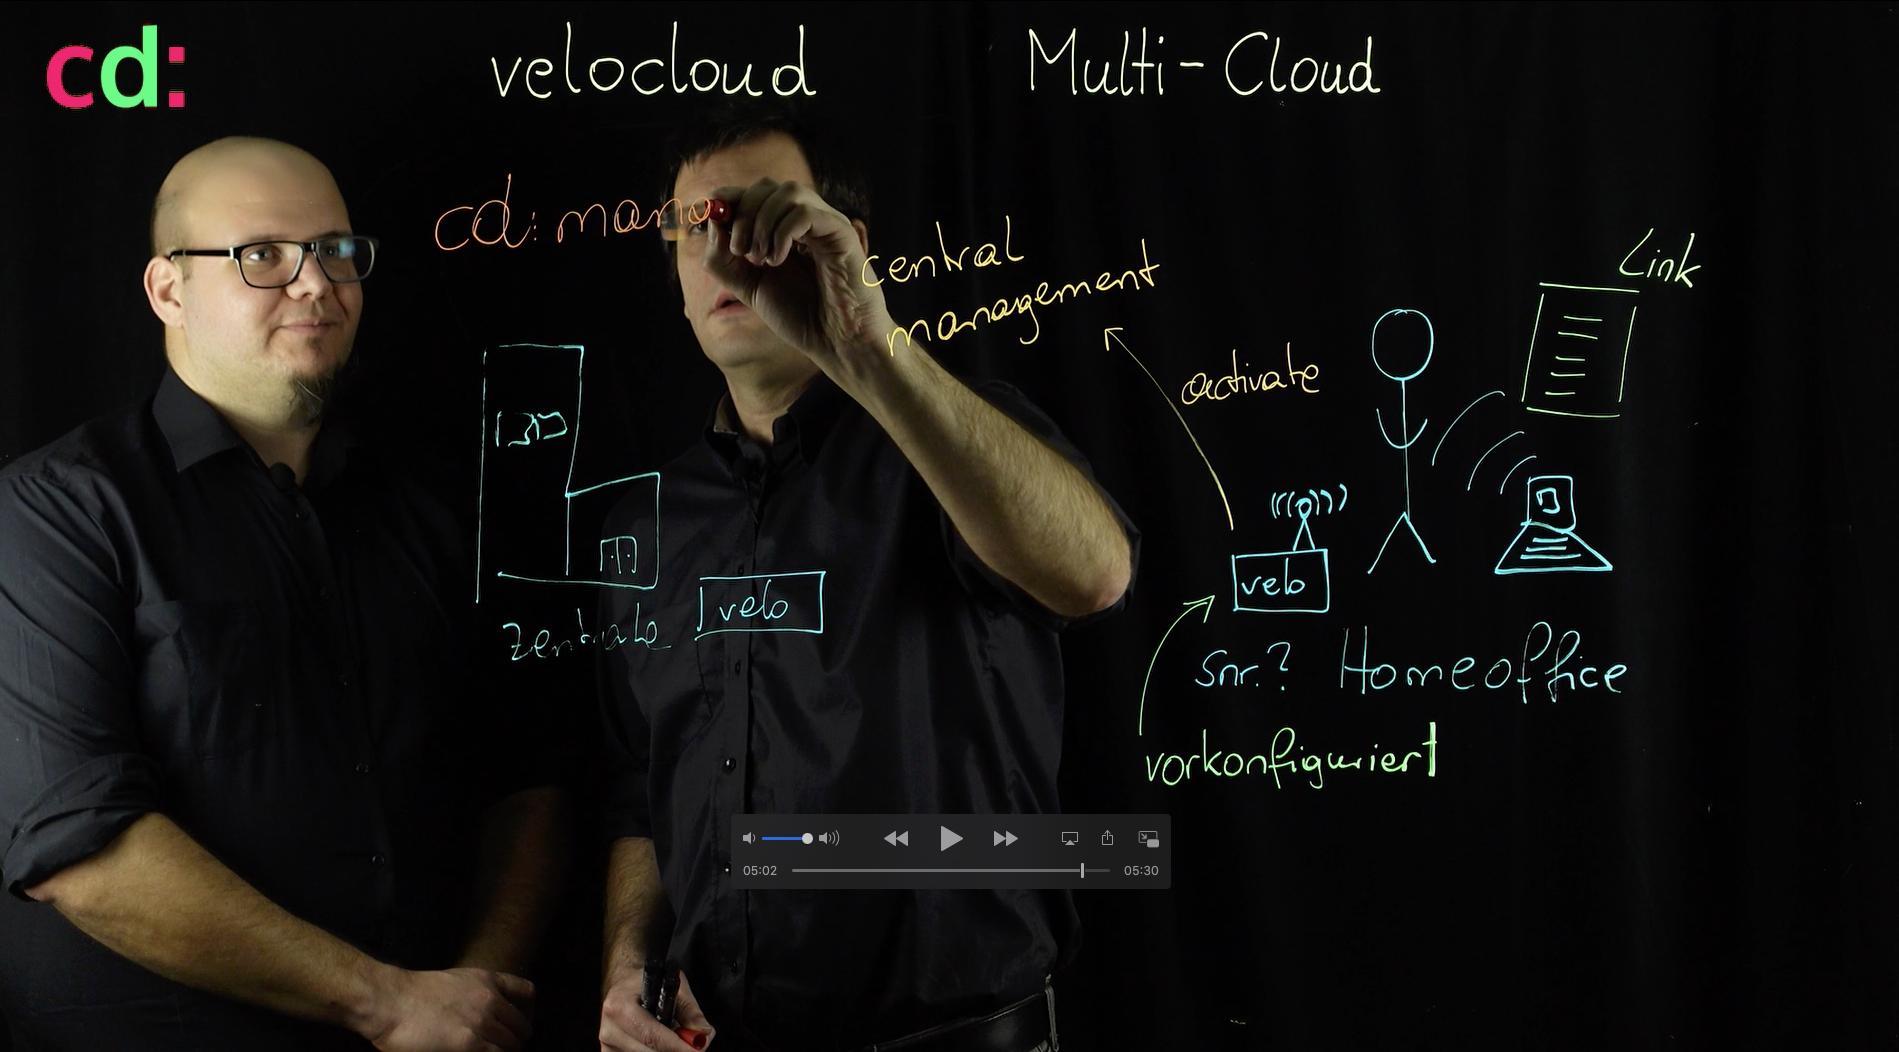 VMware SD-WAN by VeloCloud - Initiale Inbetriebnahme erklärt am Lightboard